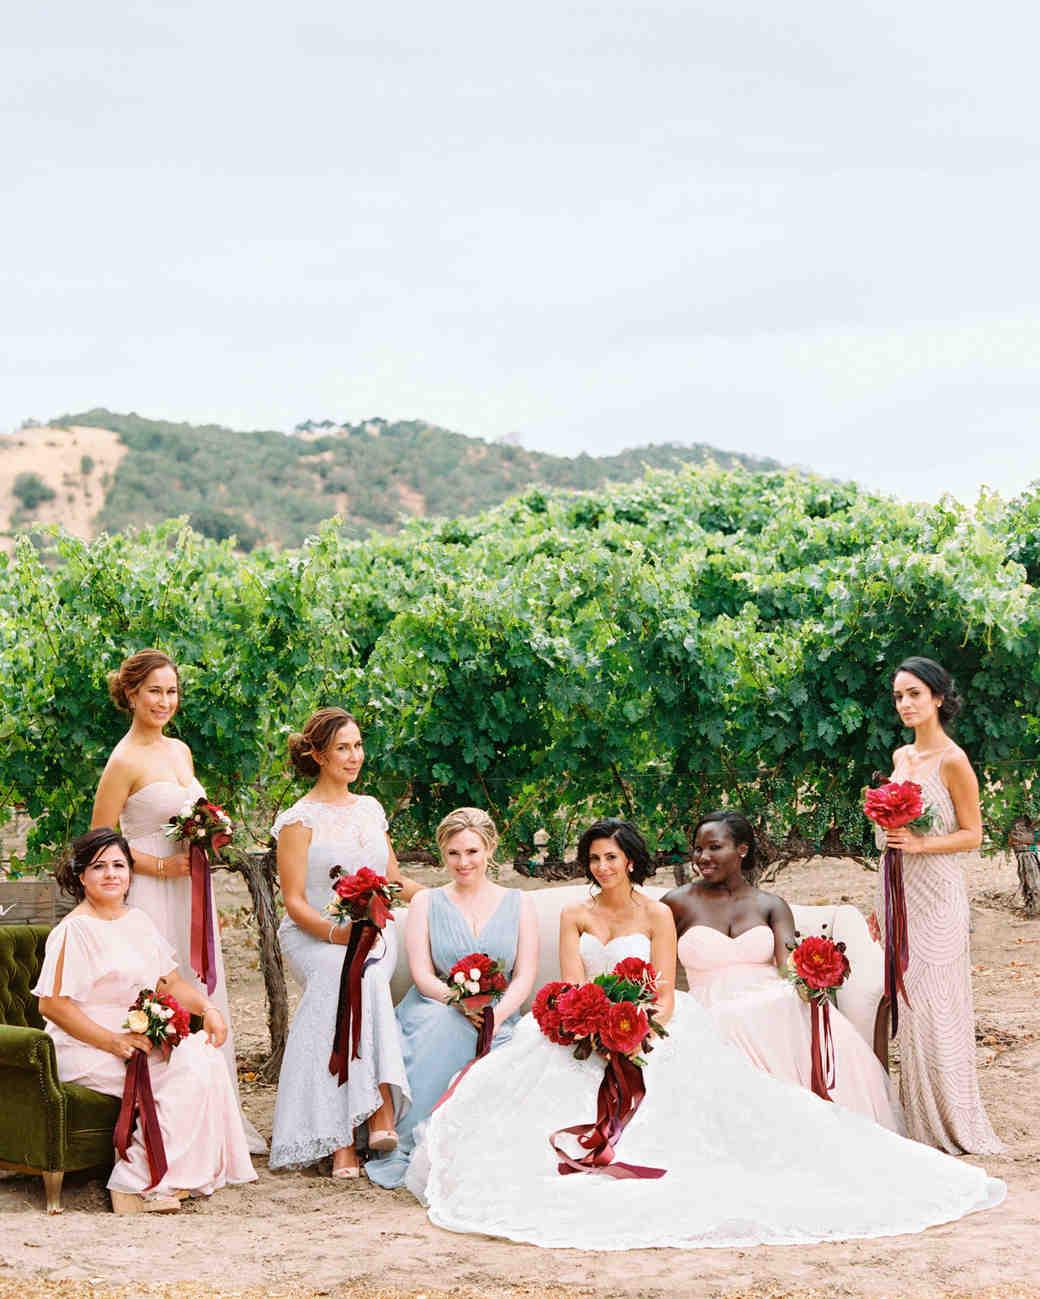 hana olu wedding california bridesmaids